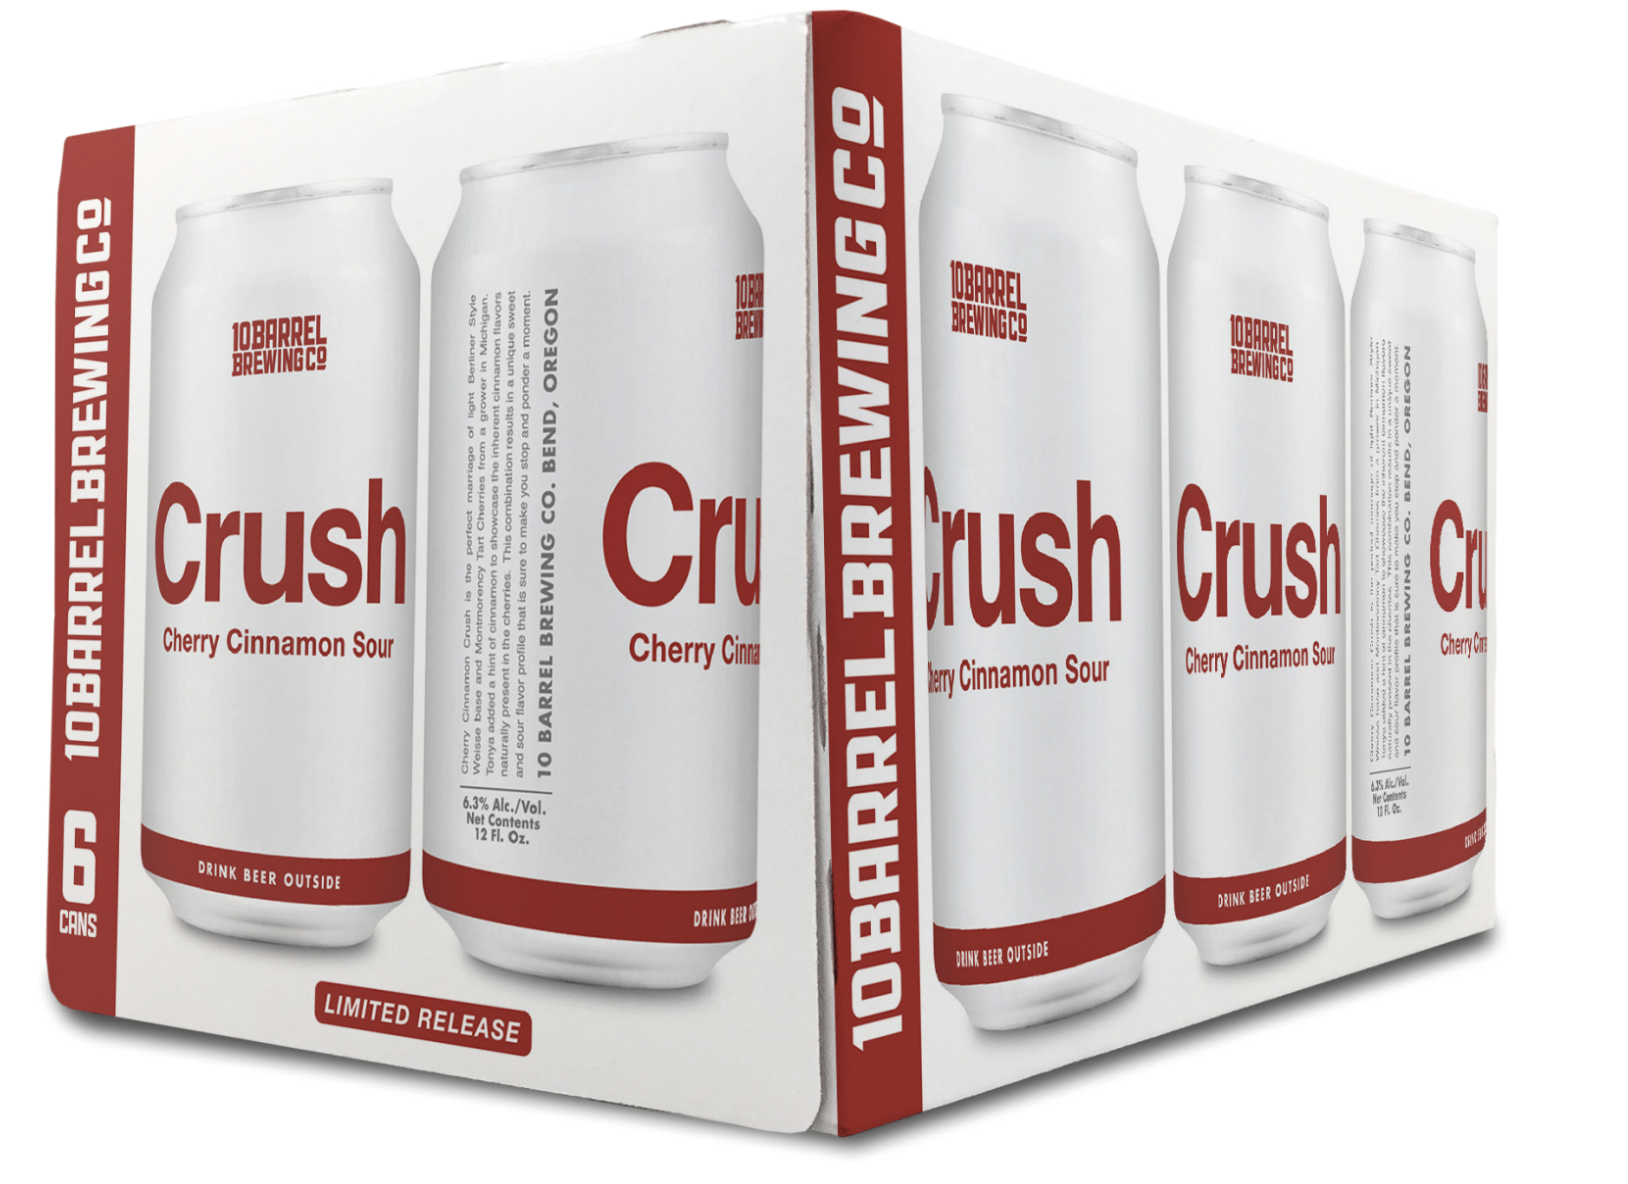 gifts-for-#vanlifer-10Barrel-cherry-cinnamon-crush.png